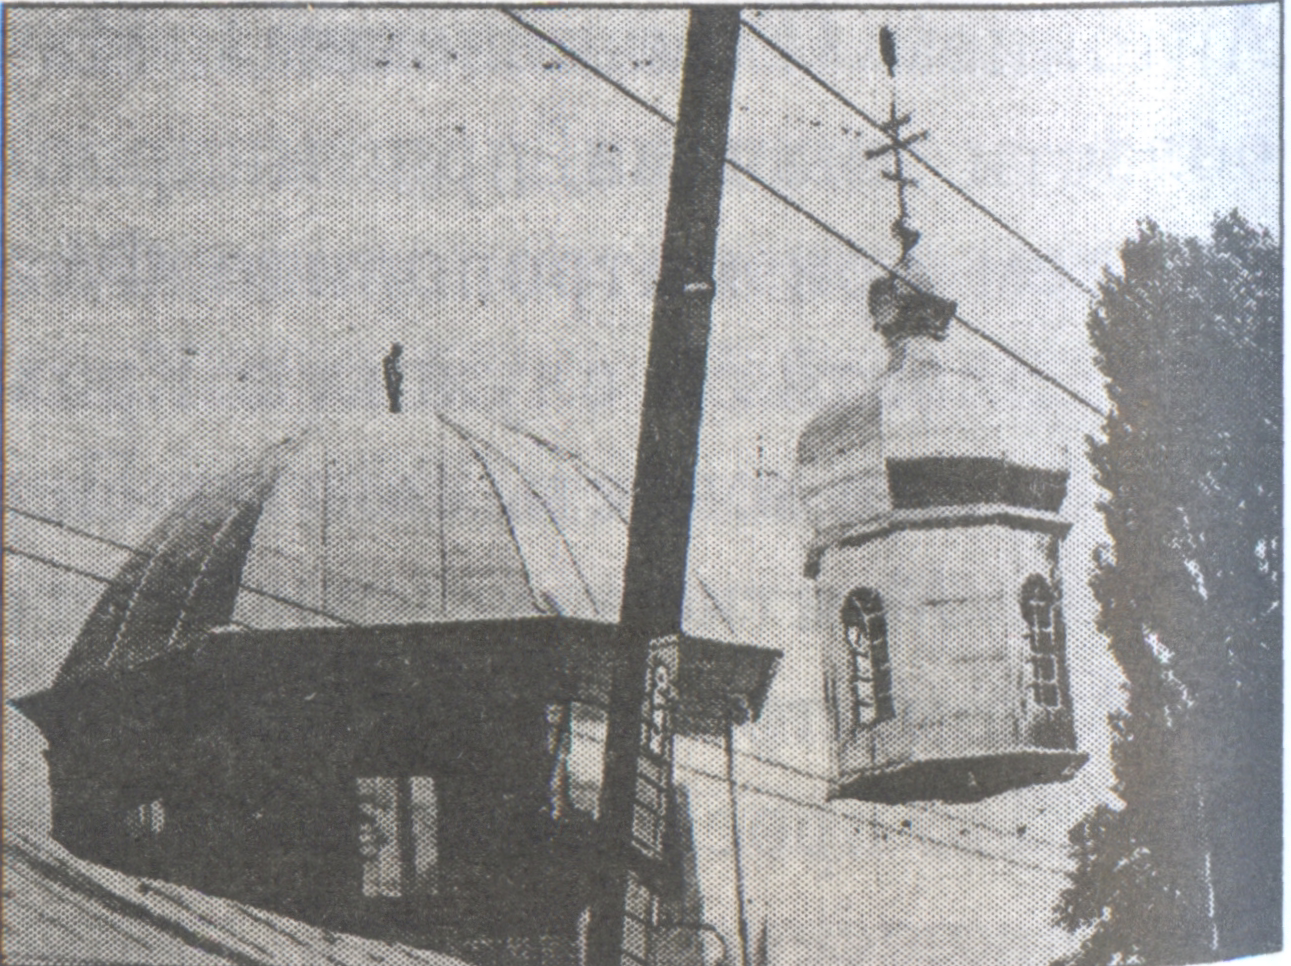 Установка центрального купола. Верхняя часть. Середина 1990-х1